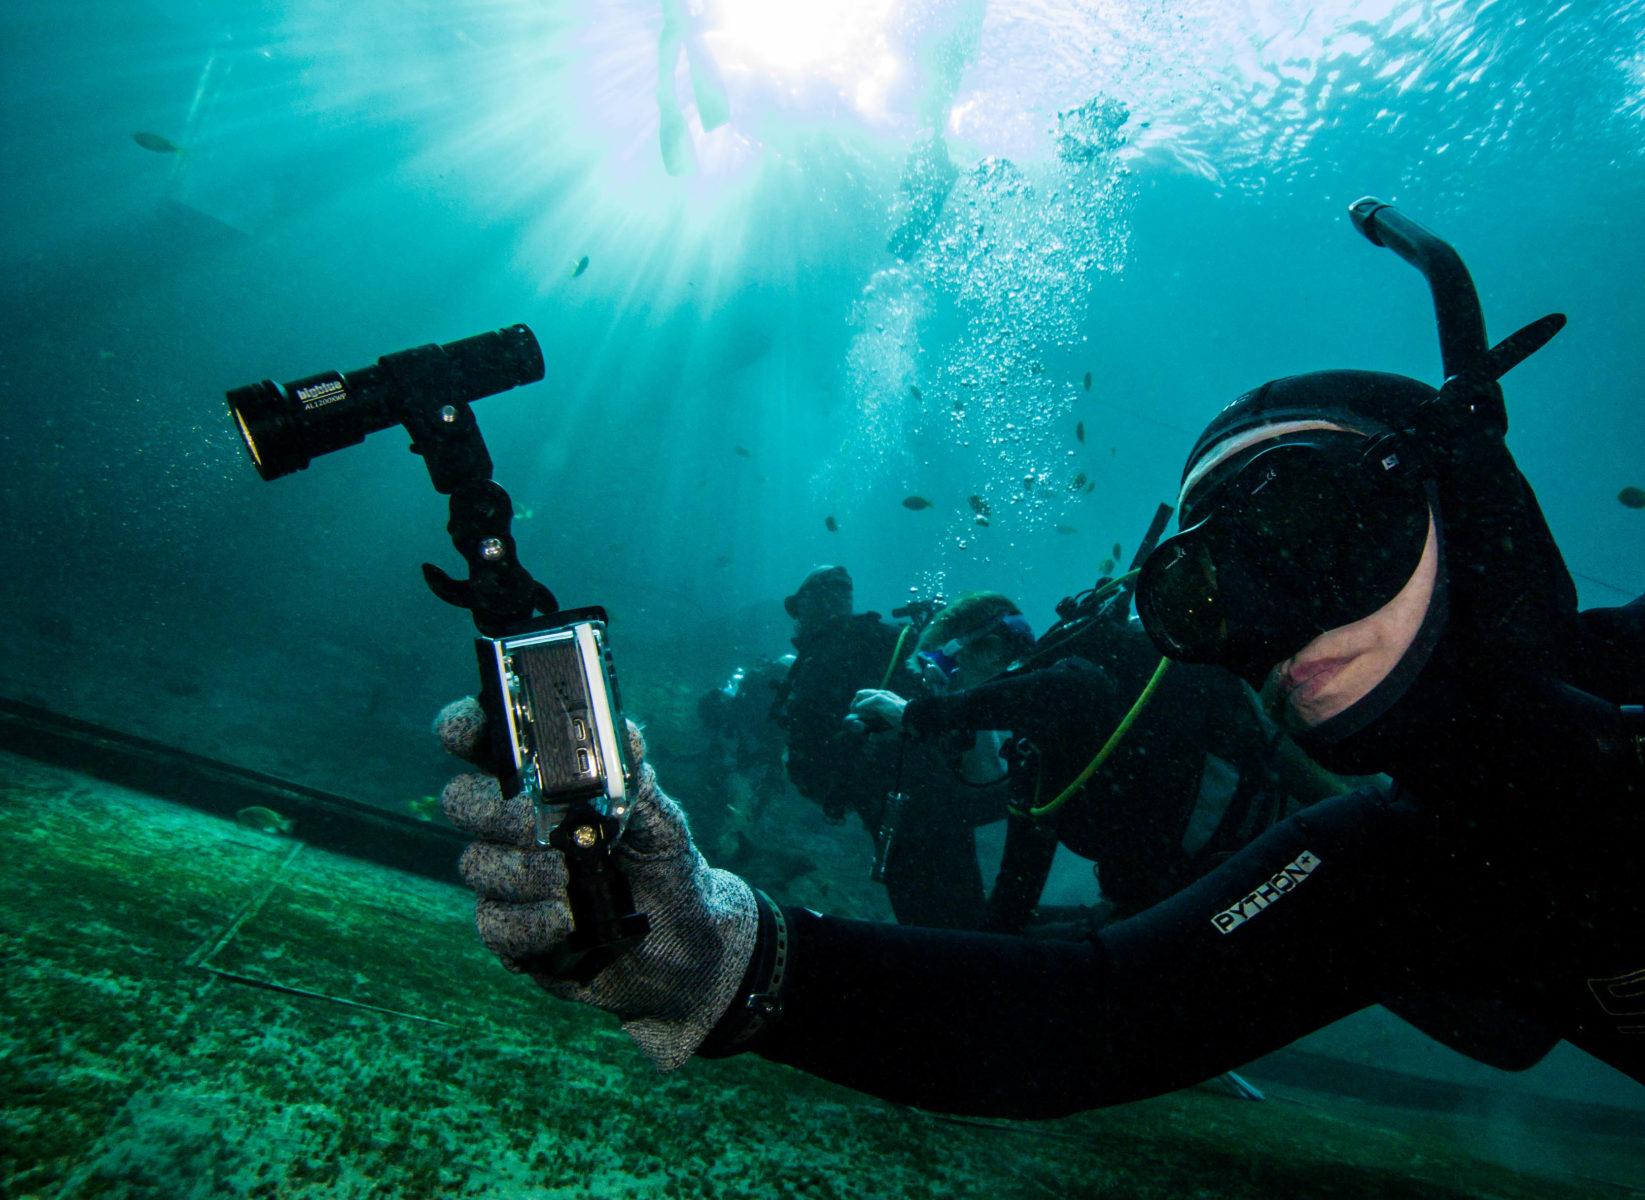 Bigblue Dive Lights Photo Gallery  Underwater Lights in